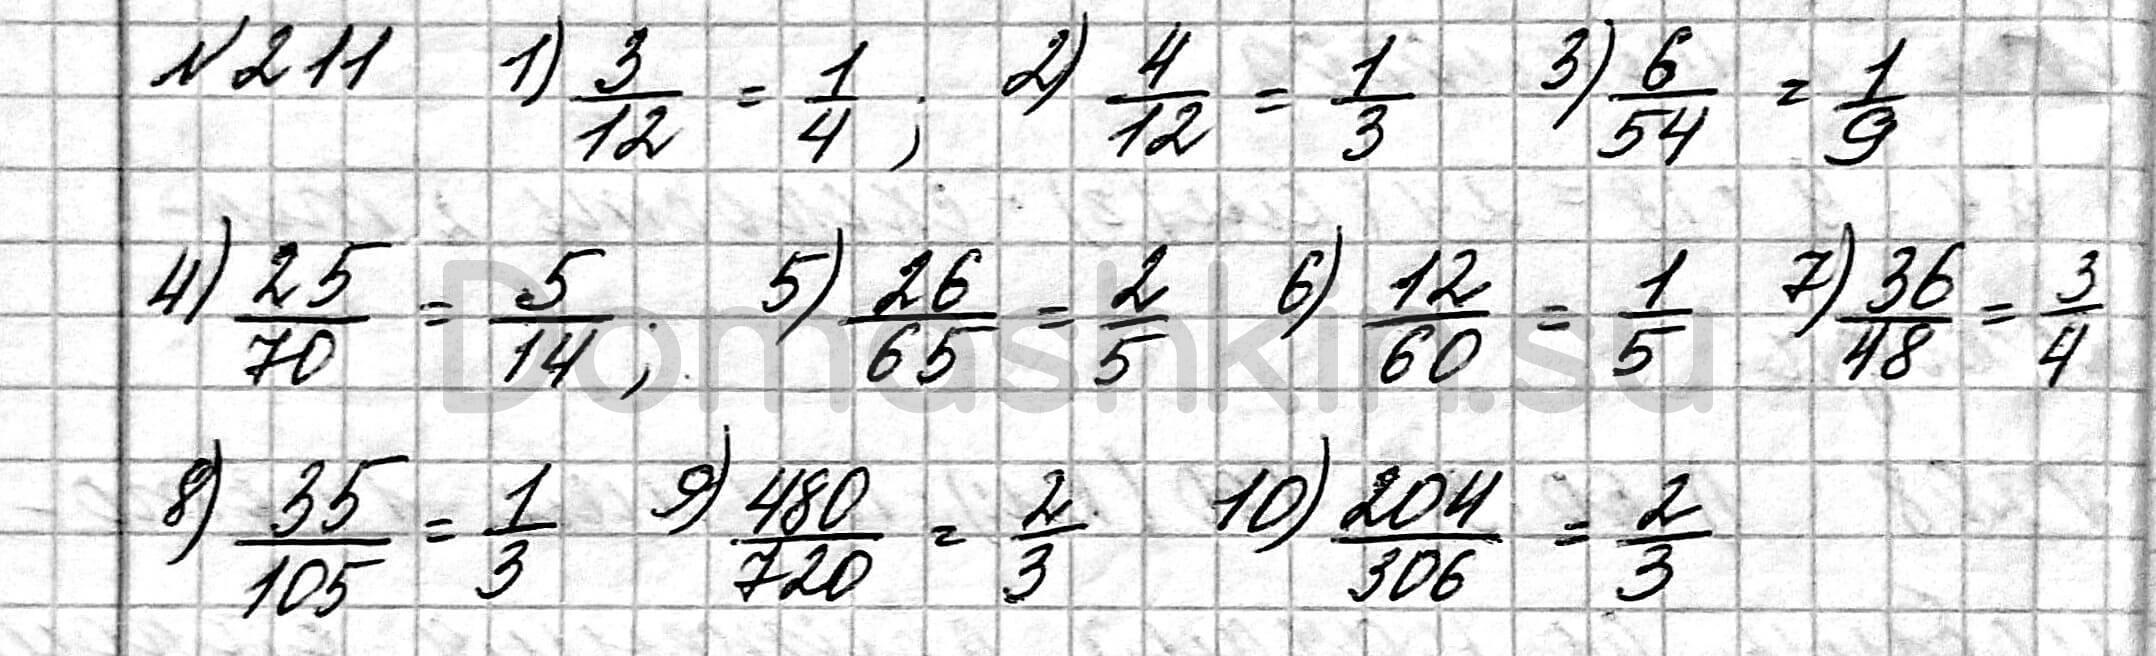 Математика 6 класс учебник Мерзляк номер 211 решение